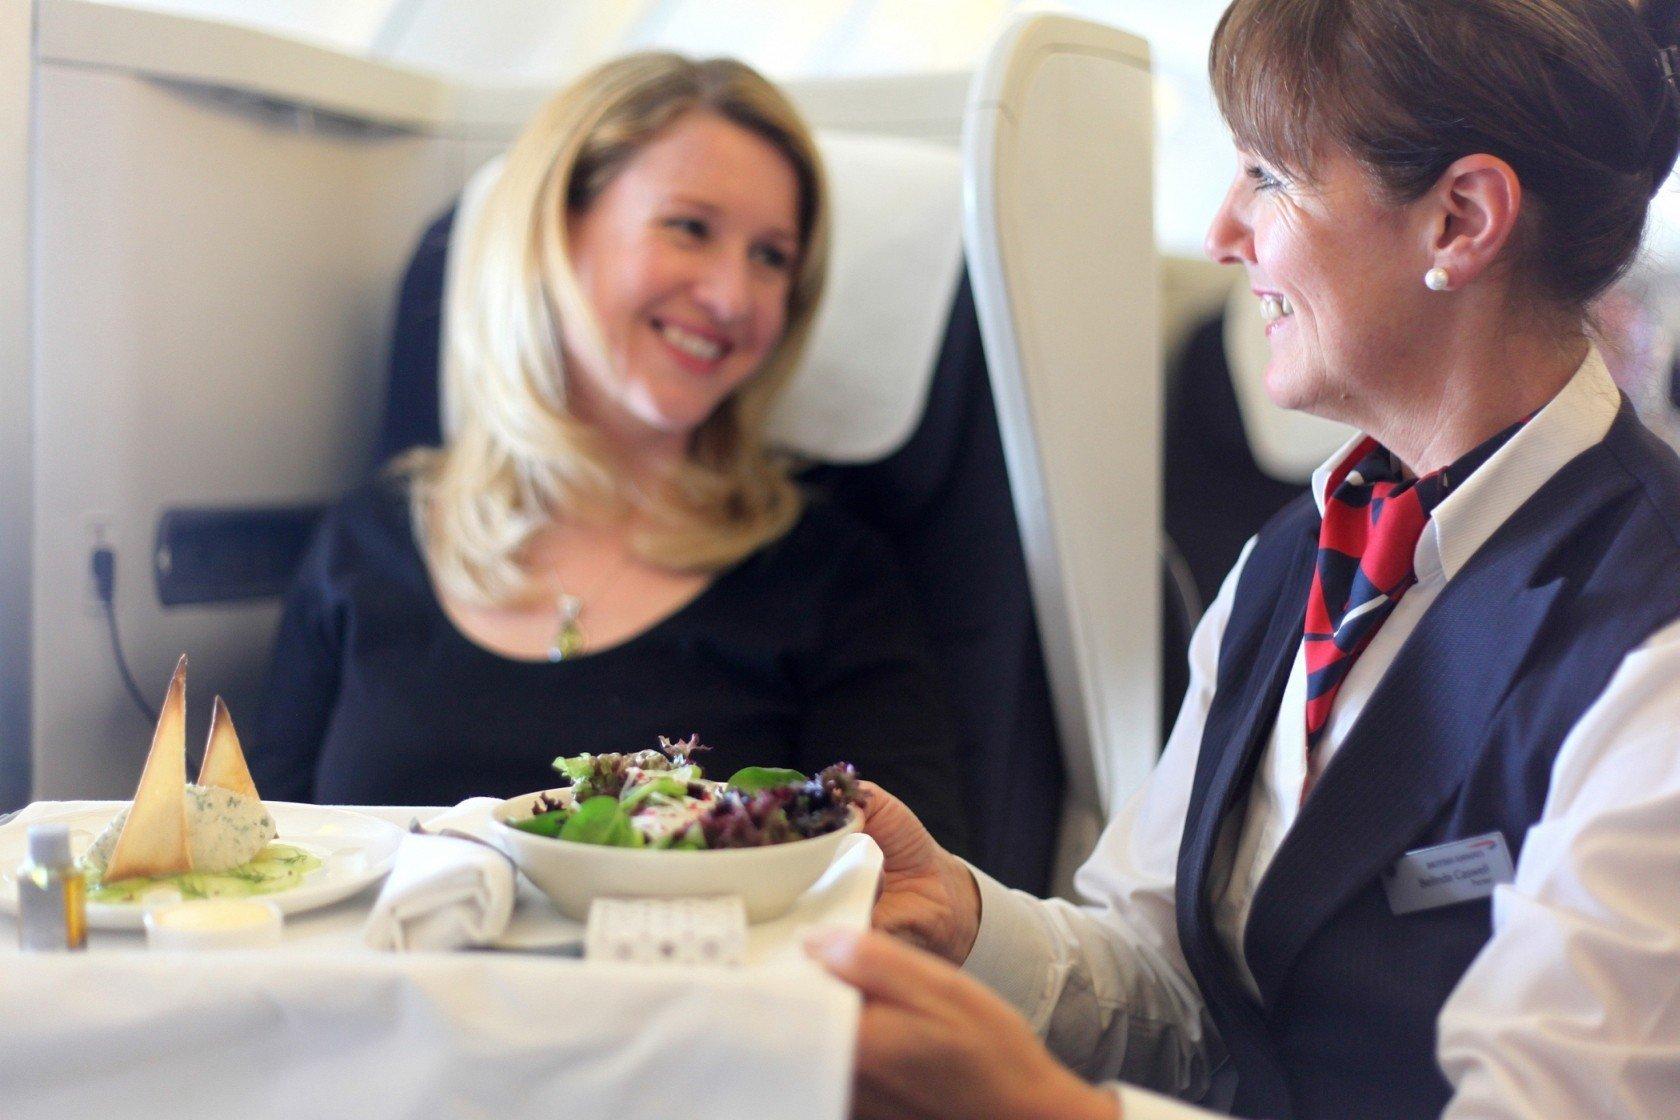 British Airways considers scrapping free long-haul food